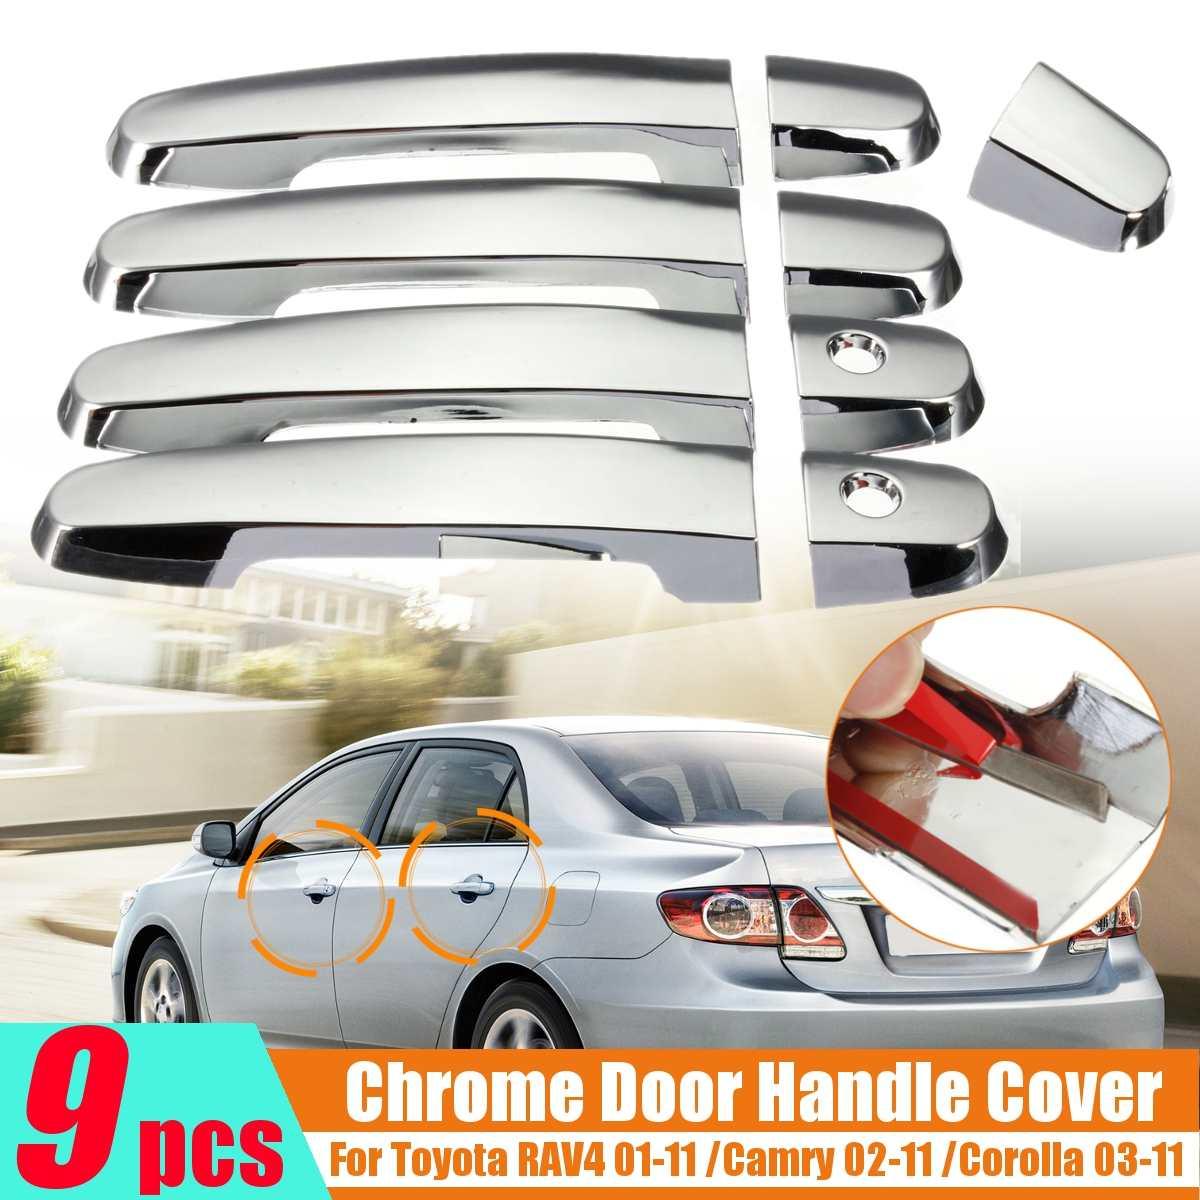 9PCS/set Car Door Handle Covers Exterior Parts Chrome For Toyota Camry Corolla RAV4 2001-2004 2005 2006 2007 2008 2009 2010 2011